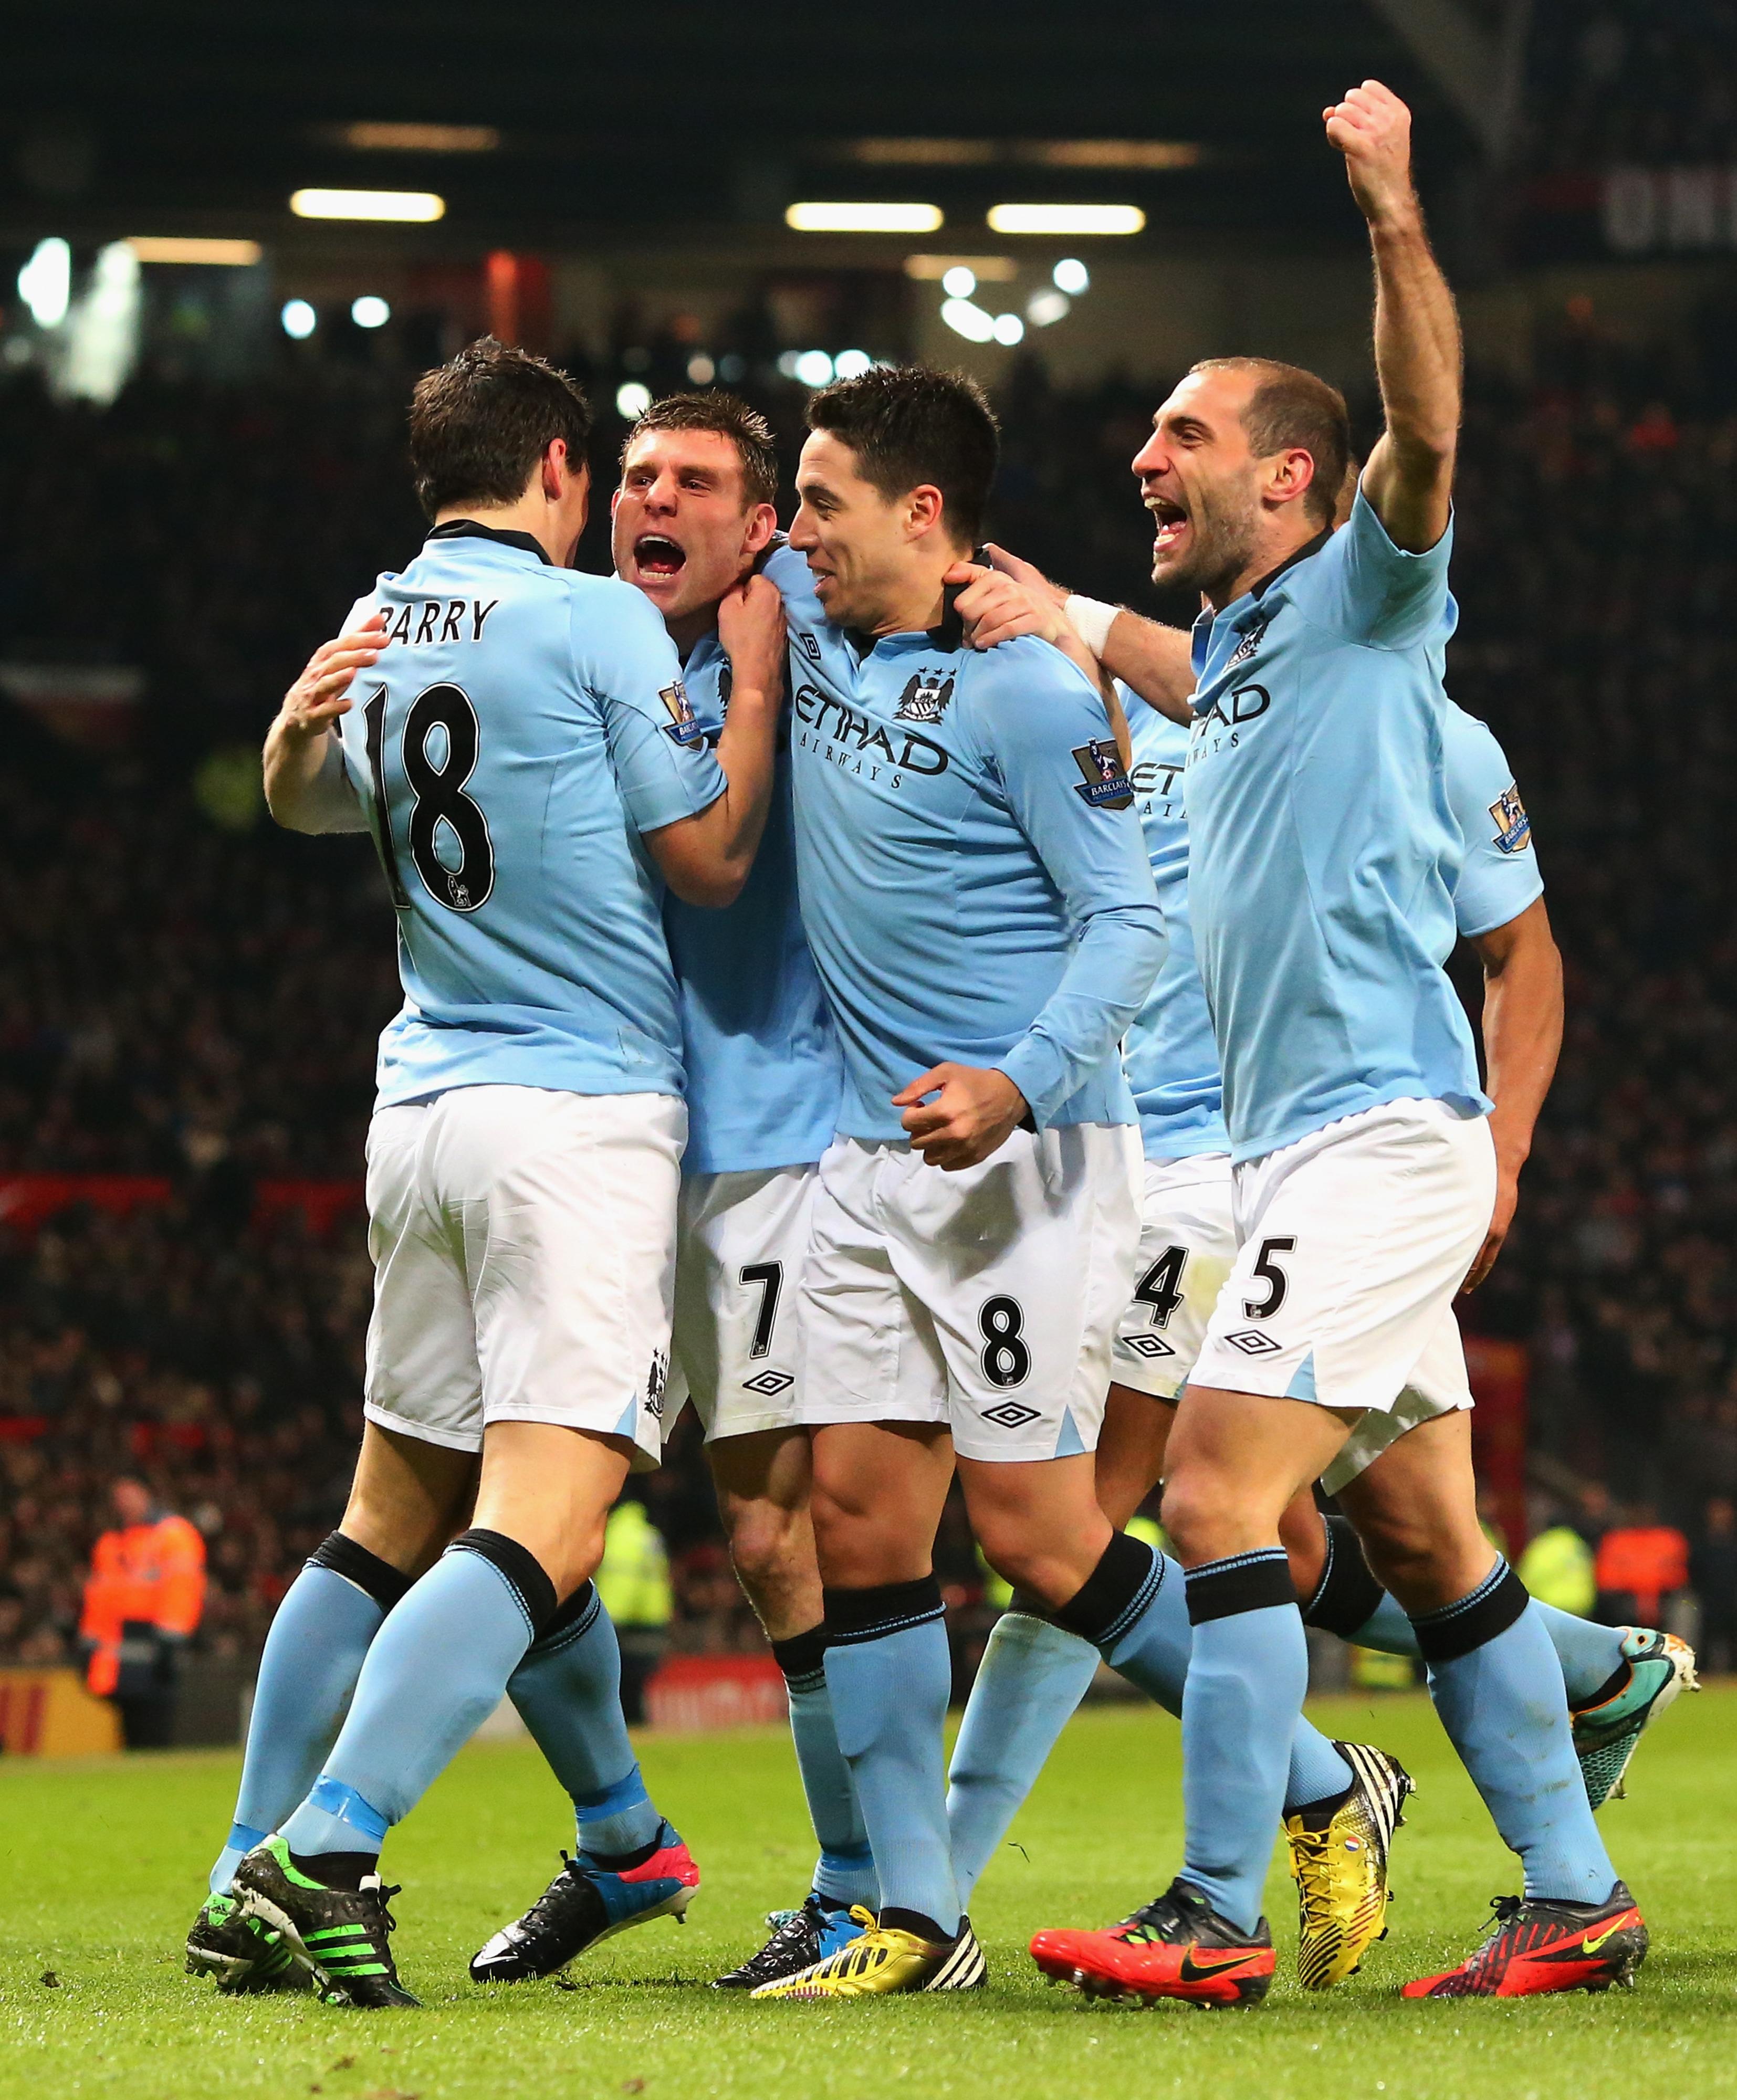 City united as Milner strikes